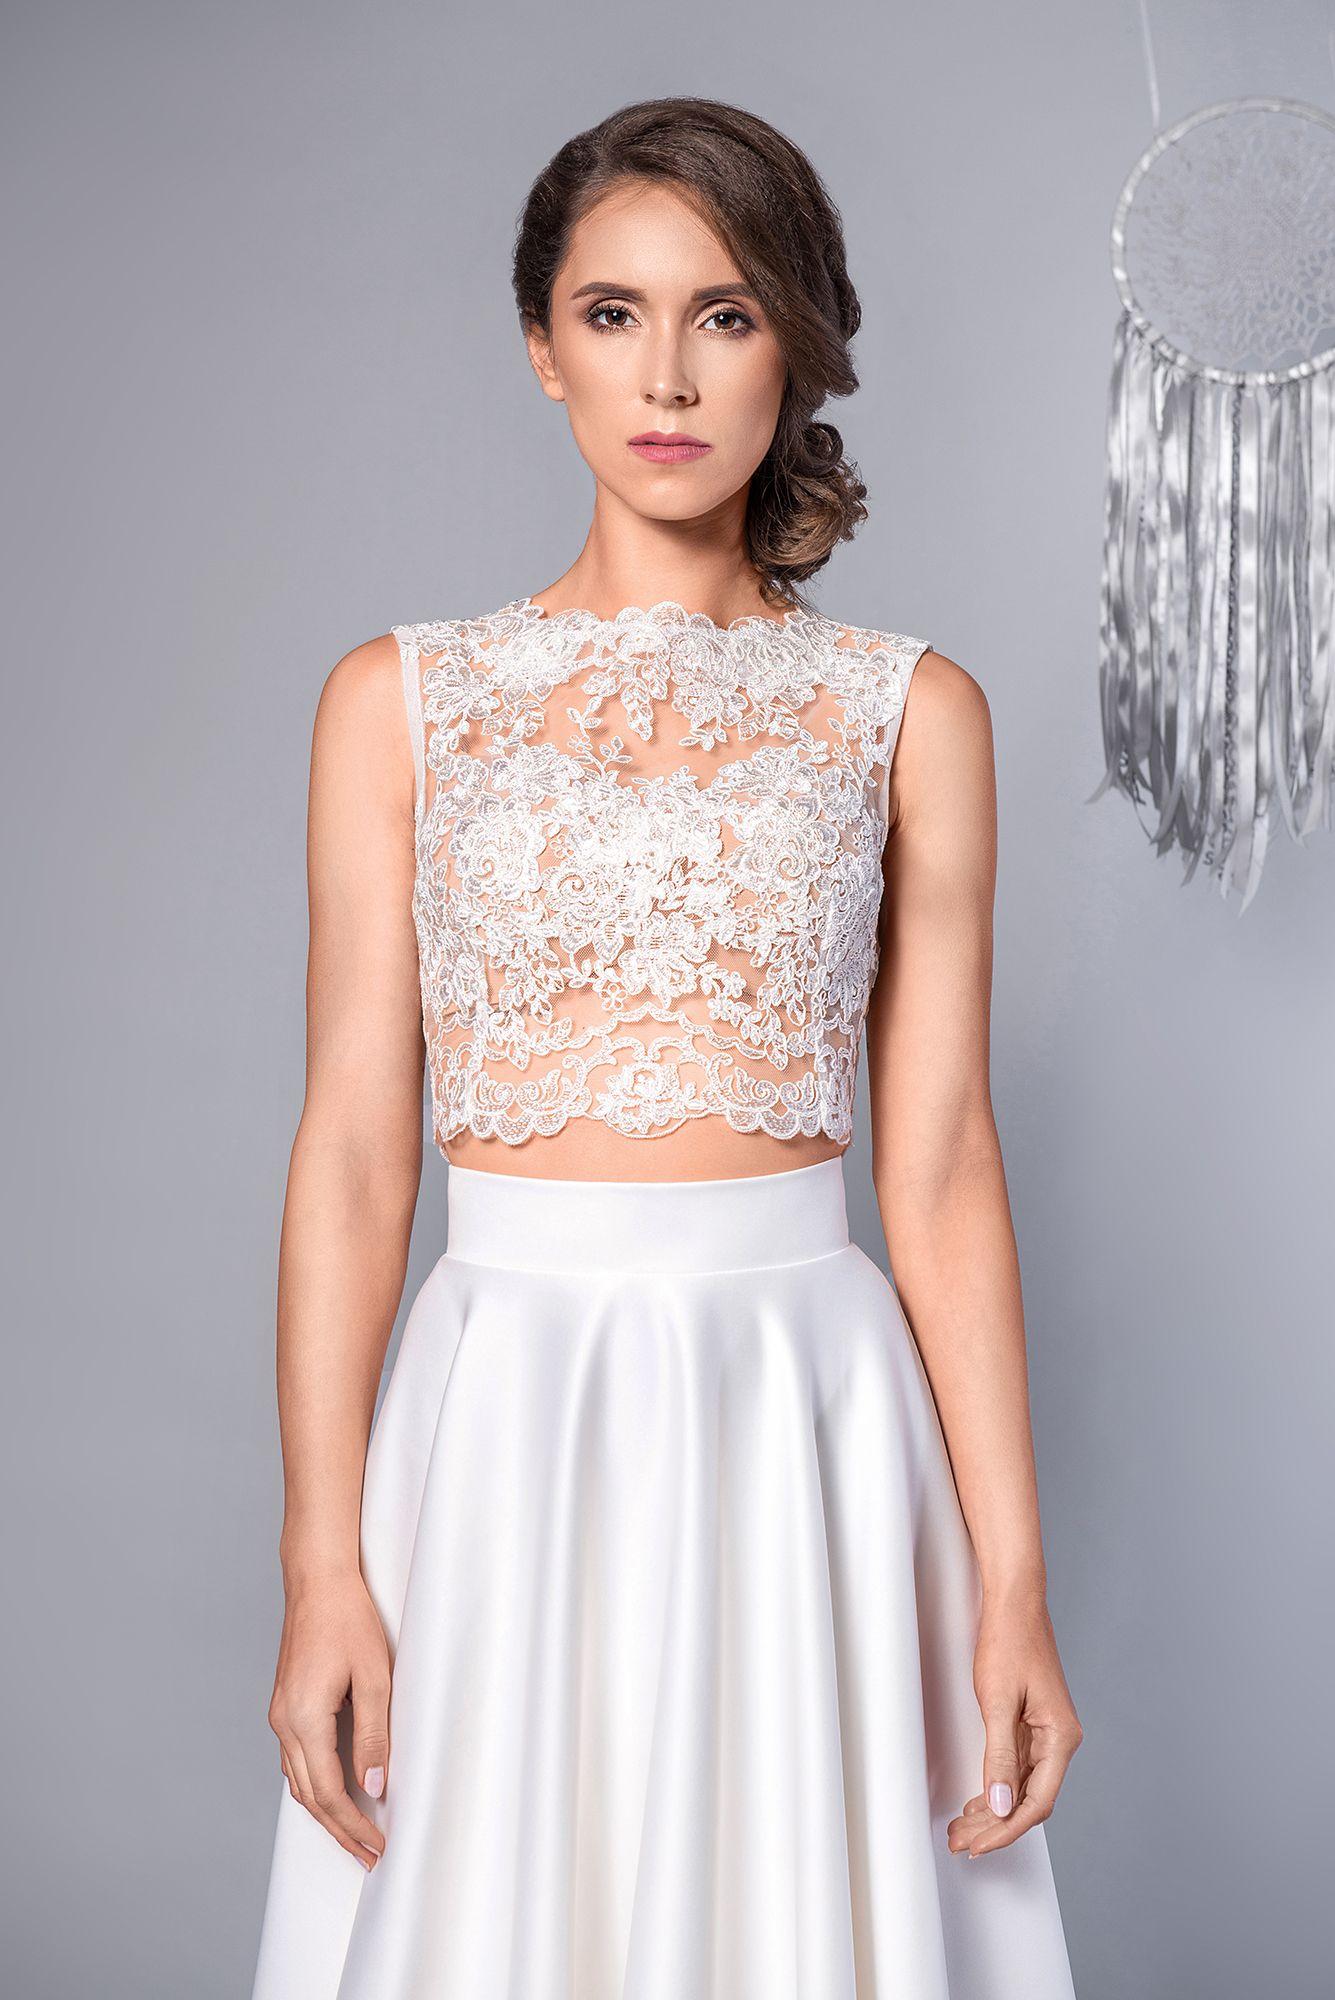 Funny Dwuczesciowa Suknia Slubna Koronkowy Top Rusical Two Piece Maxi Wedding Dress Lace Top Sukniaslubna Wedd Wedding Dresses Flower Girl Dresses Dresses